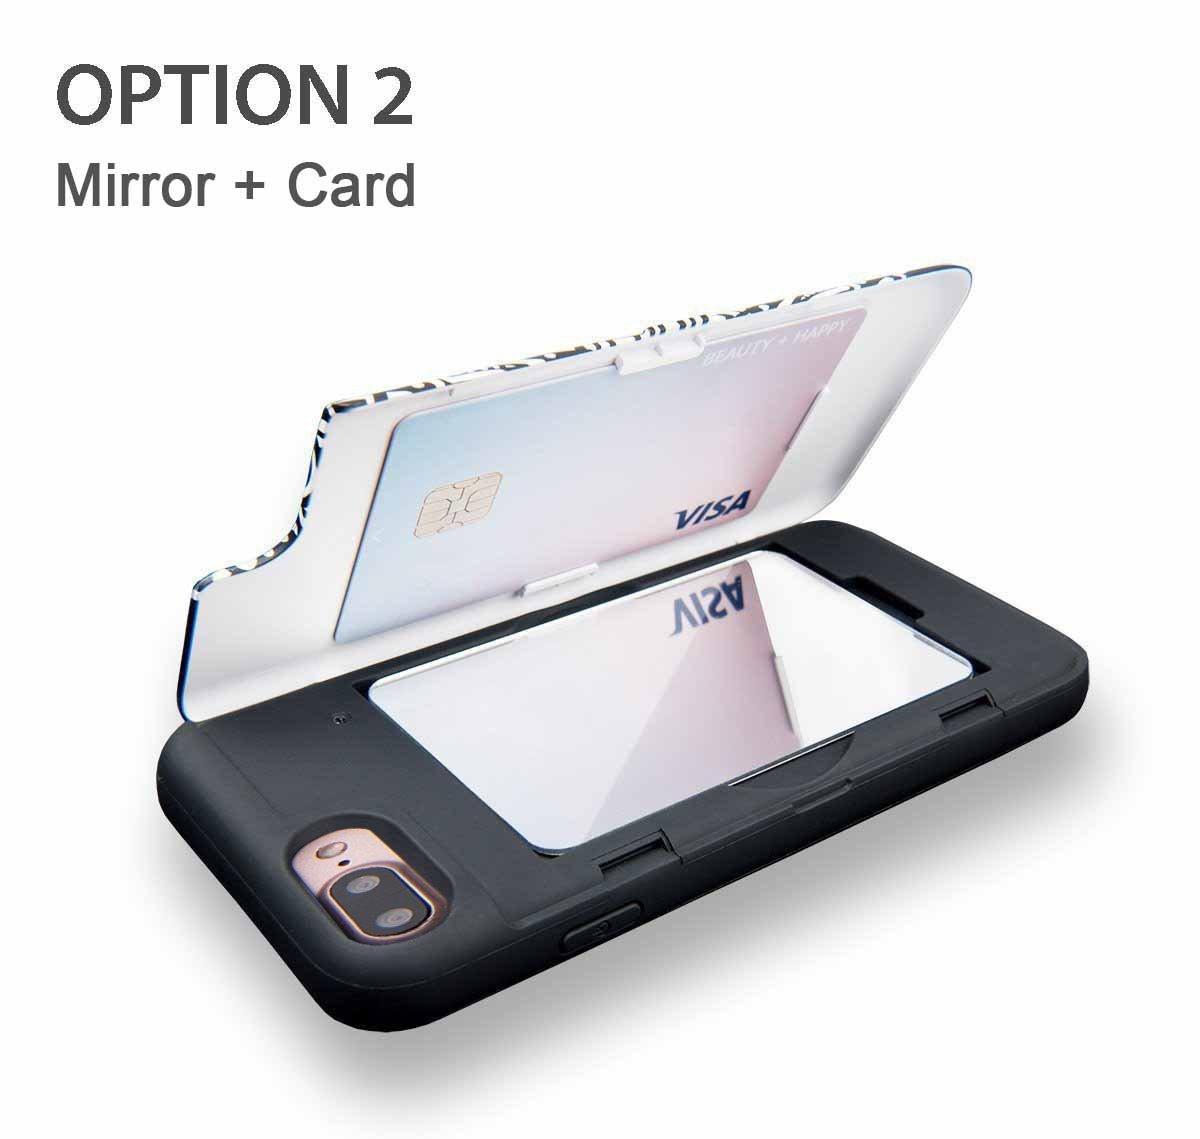 Toru Cx Pro Iphone 8 Plus Wallet Case With Hidden Id Xr Spigen Anti Shock Card Slot Slim Armor Cs Casing Black Credit Holder Hard Cover Mirror For 7 Matte